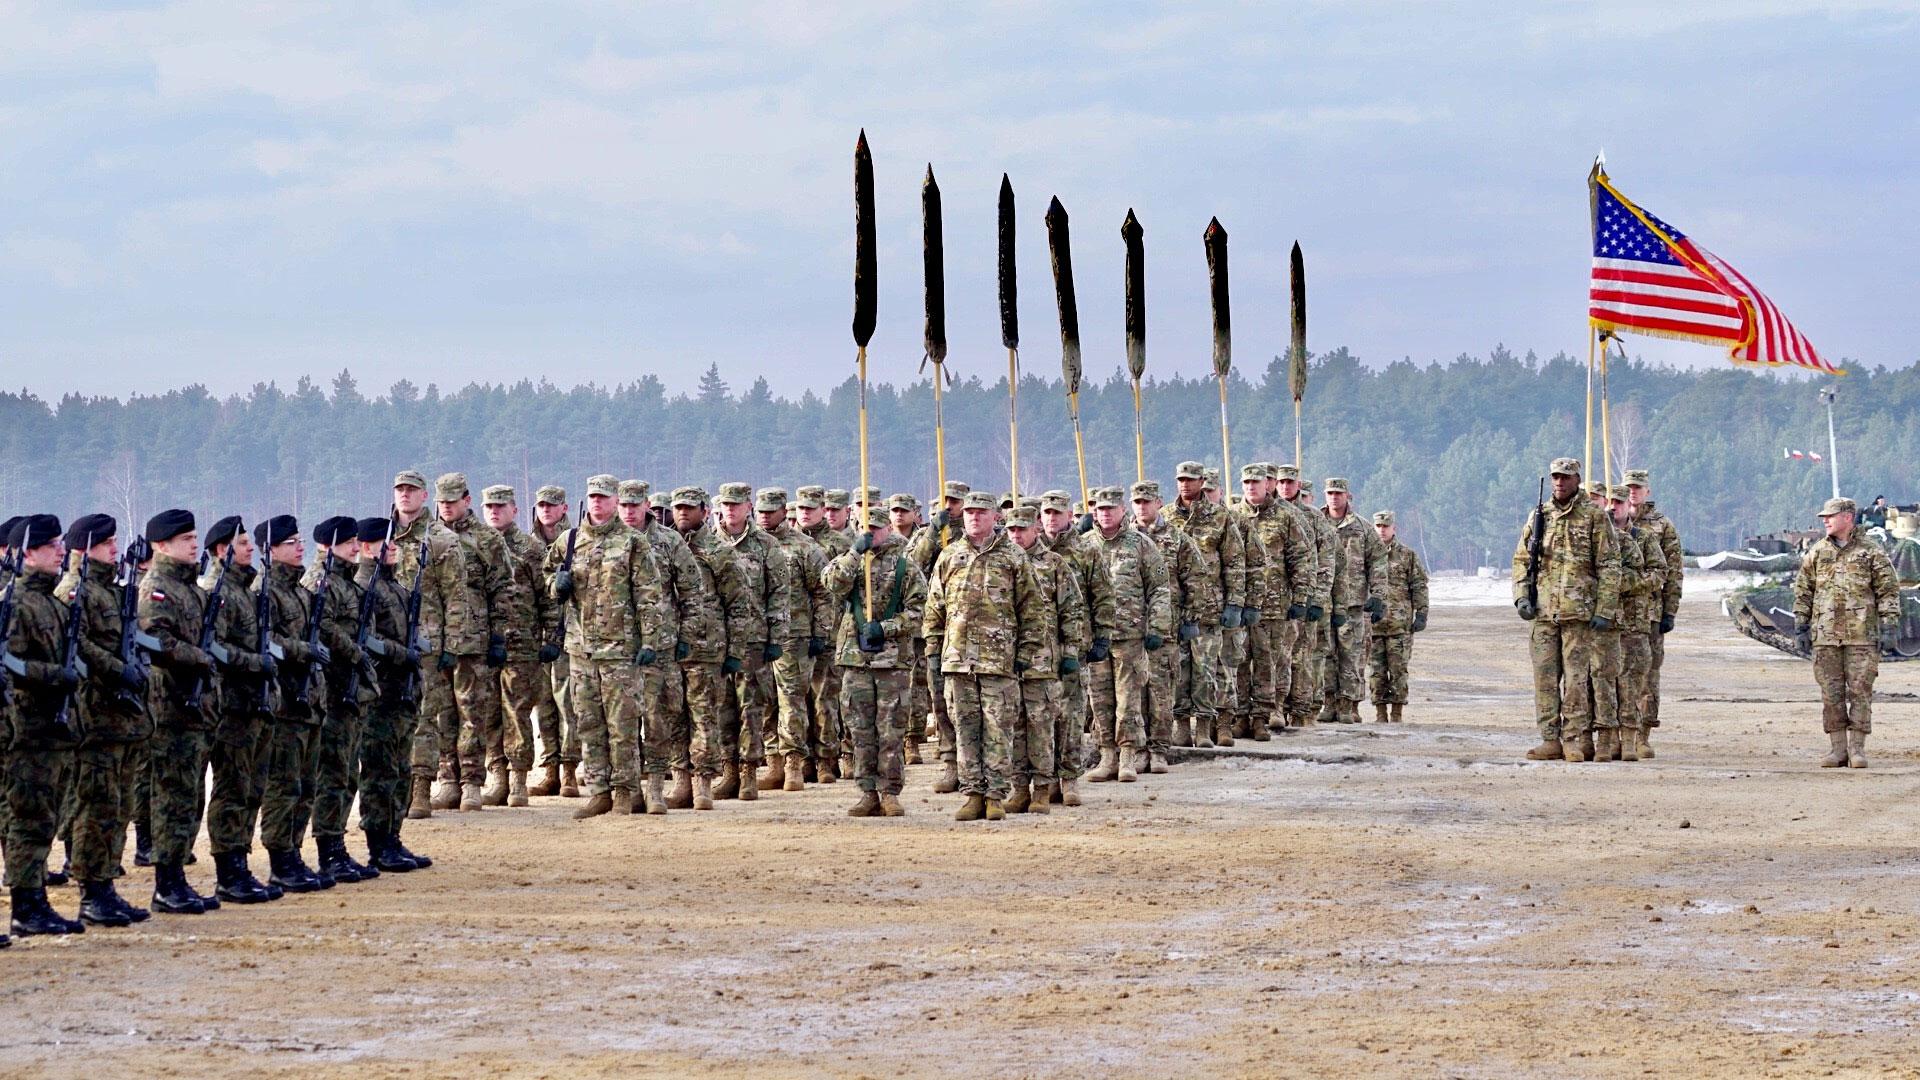 Ryska soldater ut ur baltikum